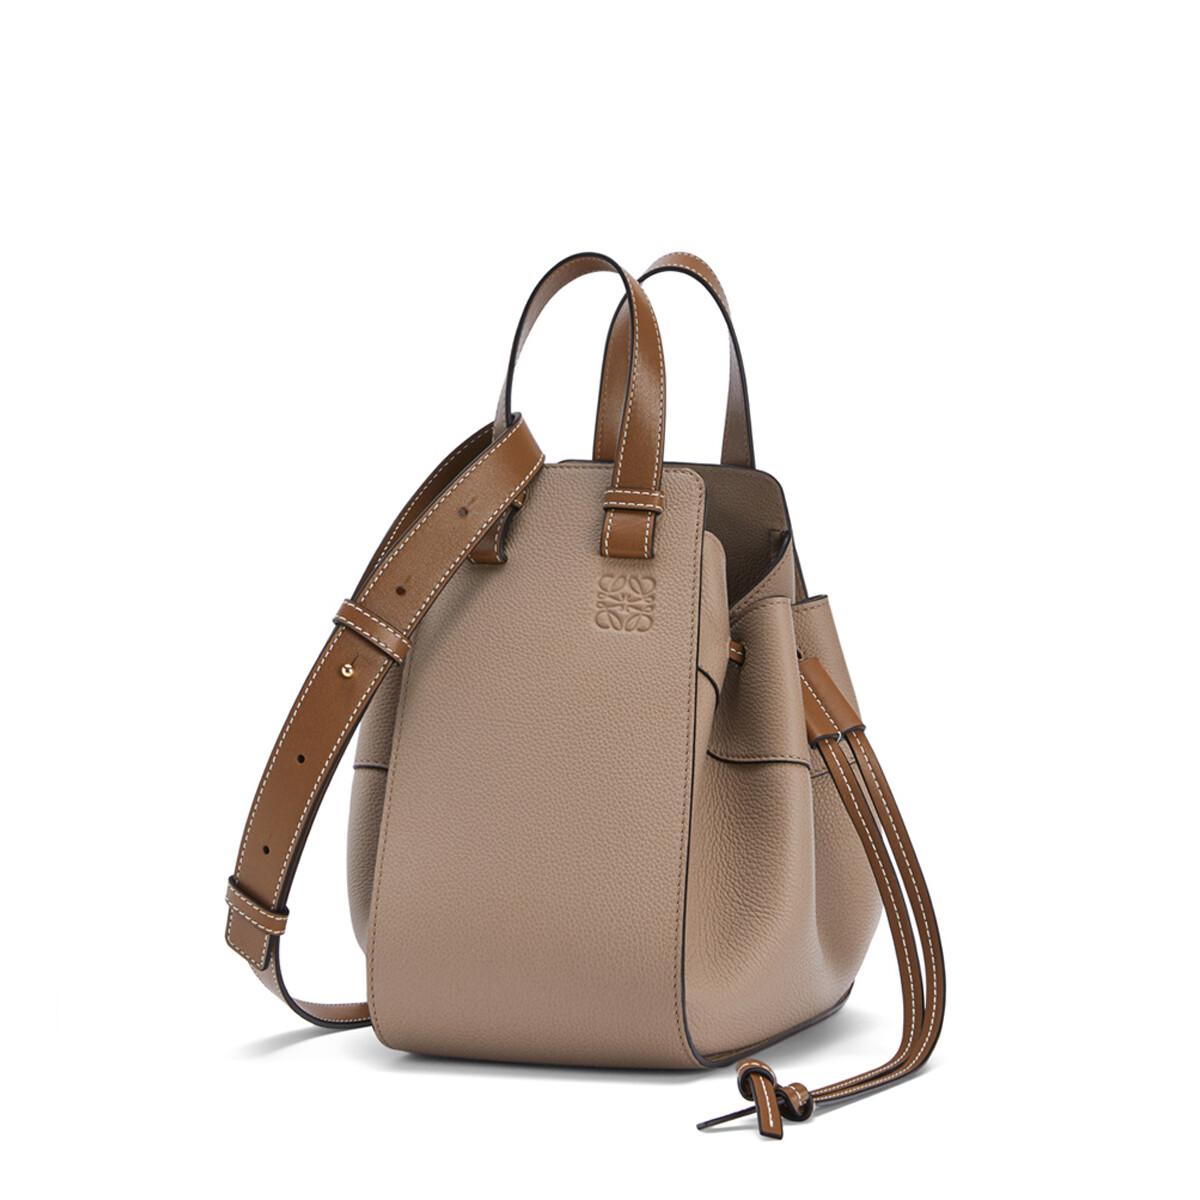 LOEWE Hammock Drawstring Small Bag Sand/Mink Color front